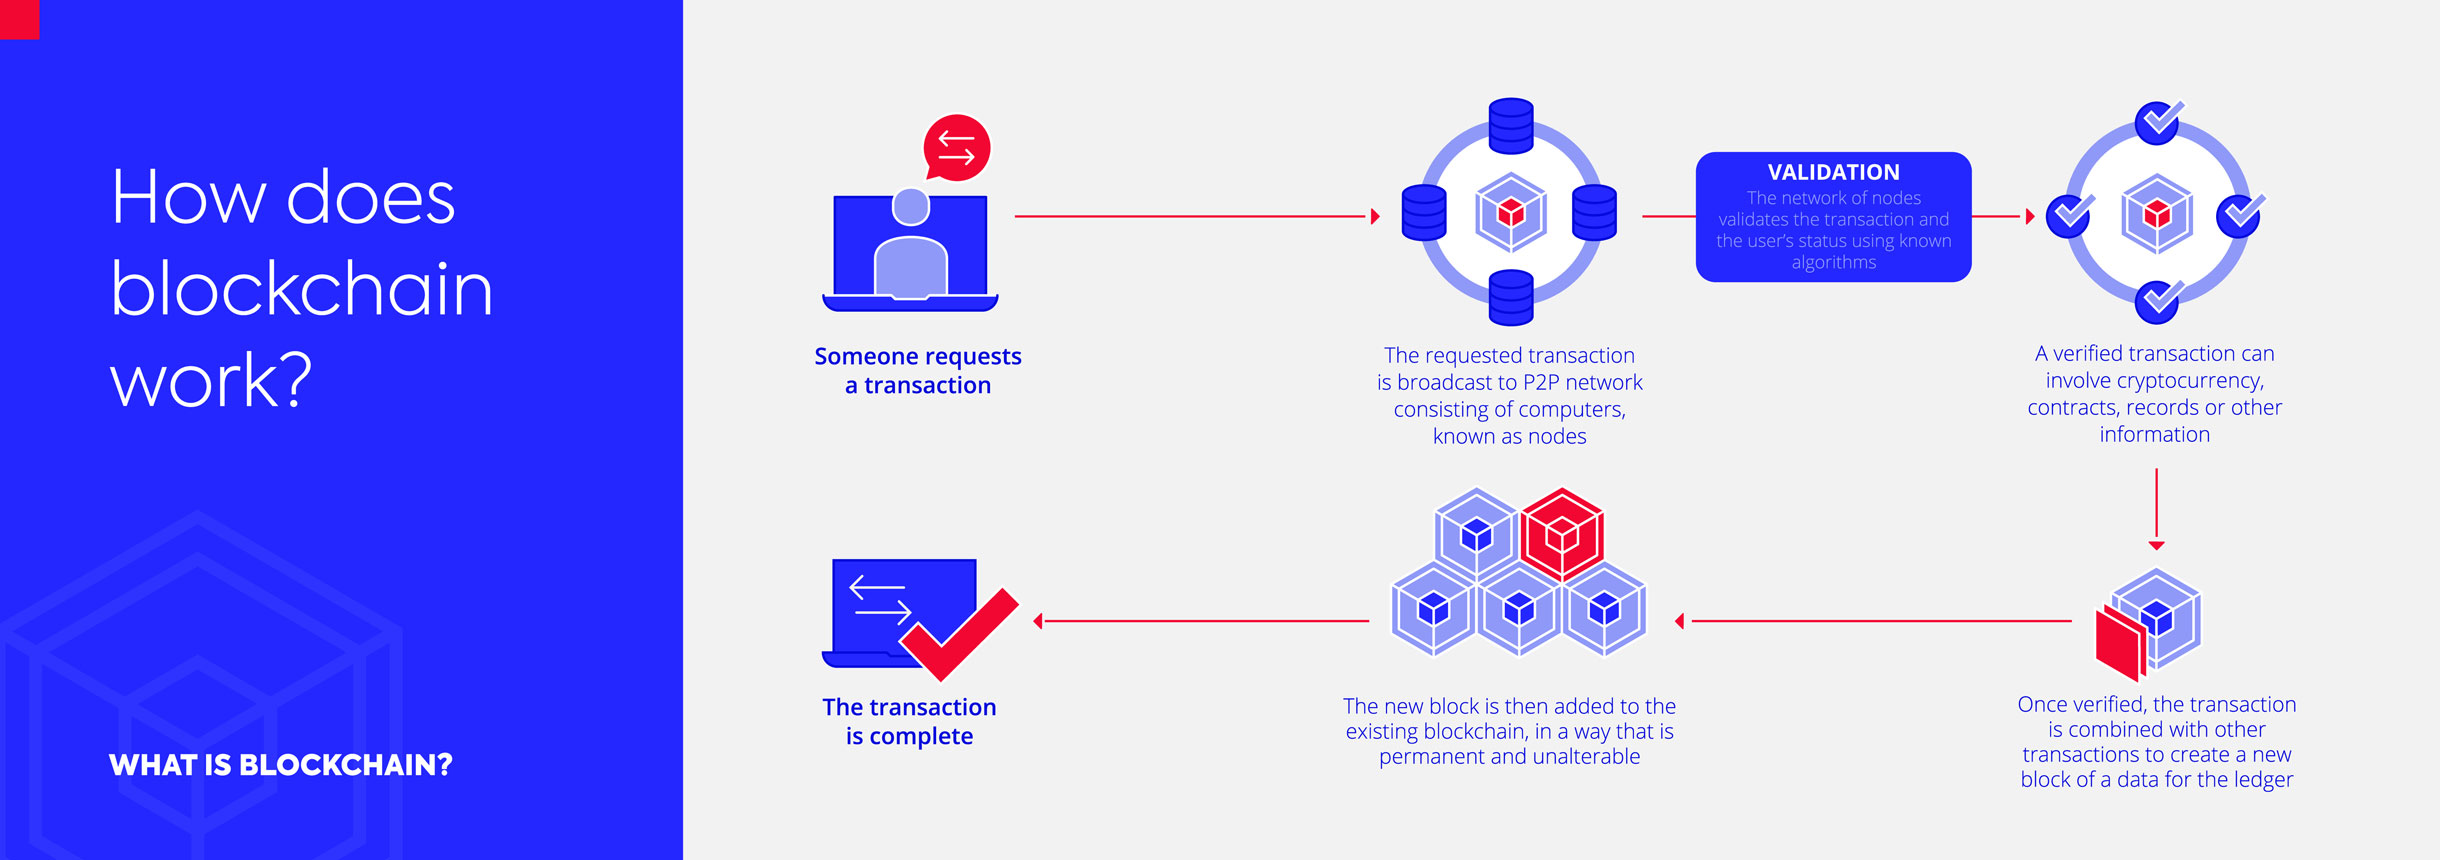 Diagram explaining how blockchain works